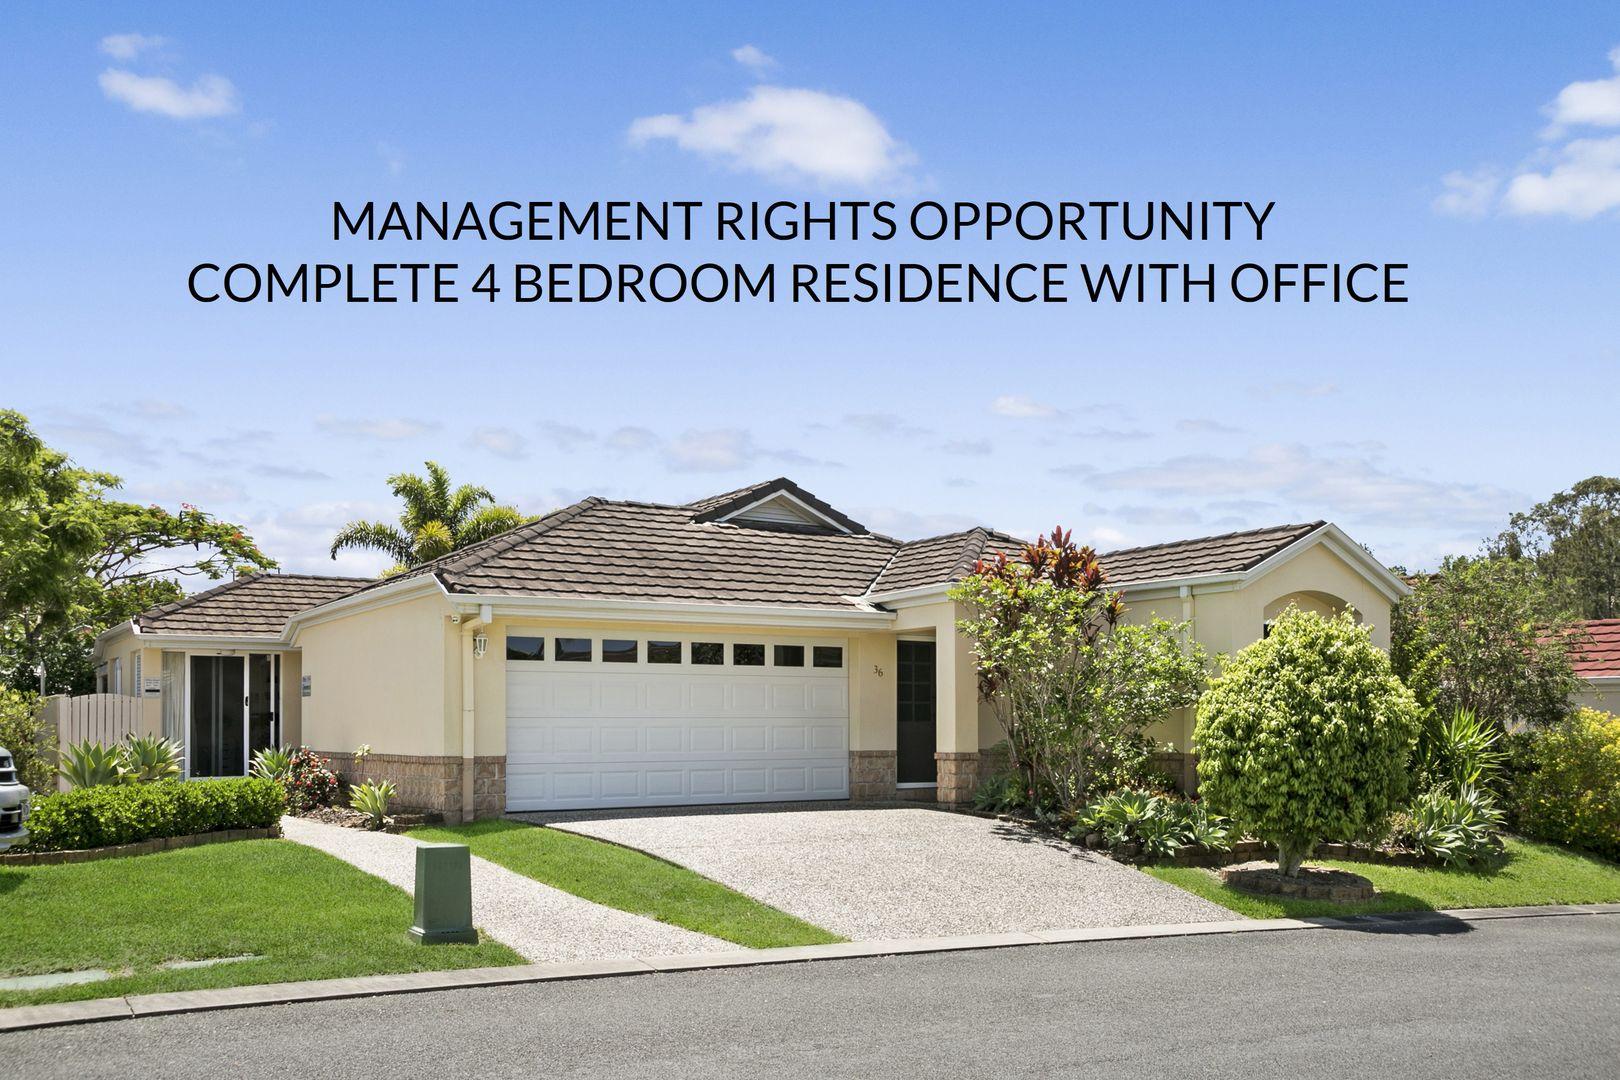 36/29 Ellis Drive, Mudgeeraba QLD 4213, Image 0